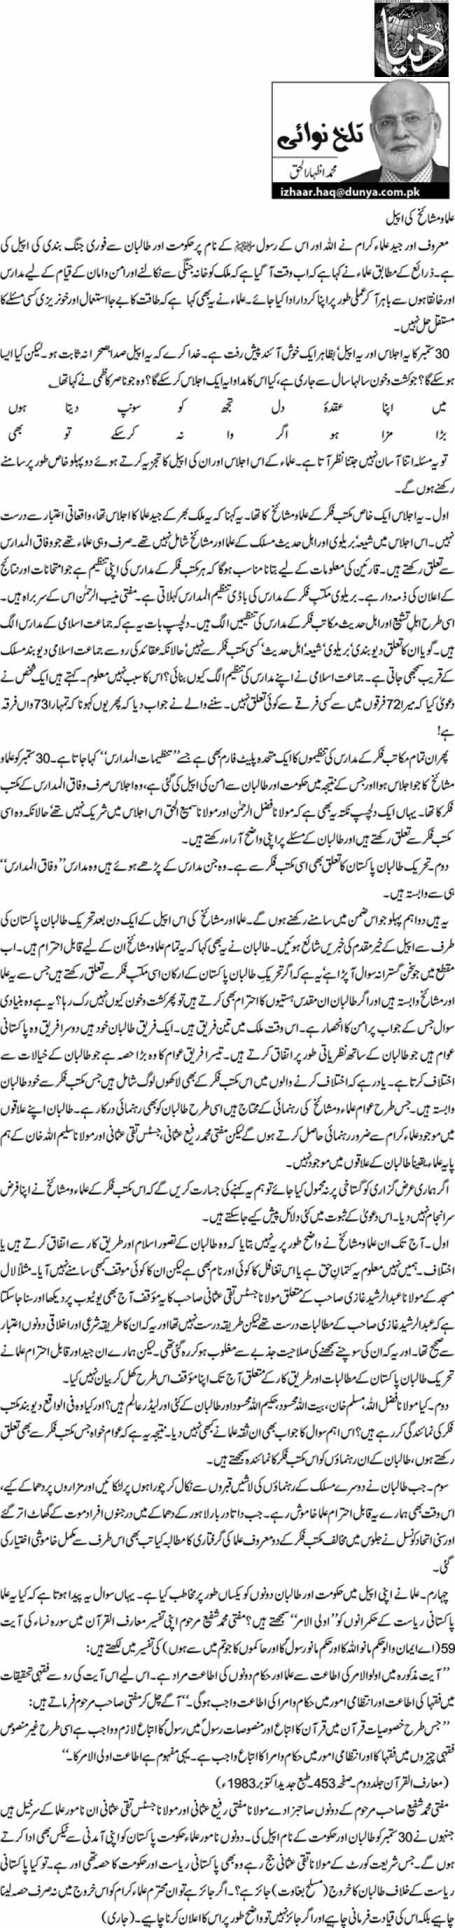 Ulma o Mashaikh Ki Apeel - M. Izhar ul Haq